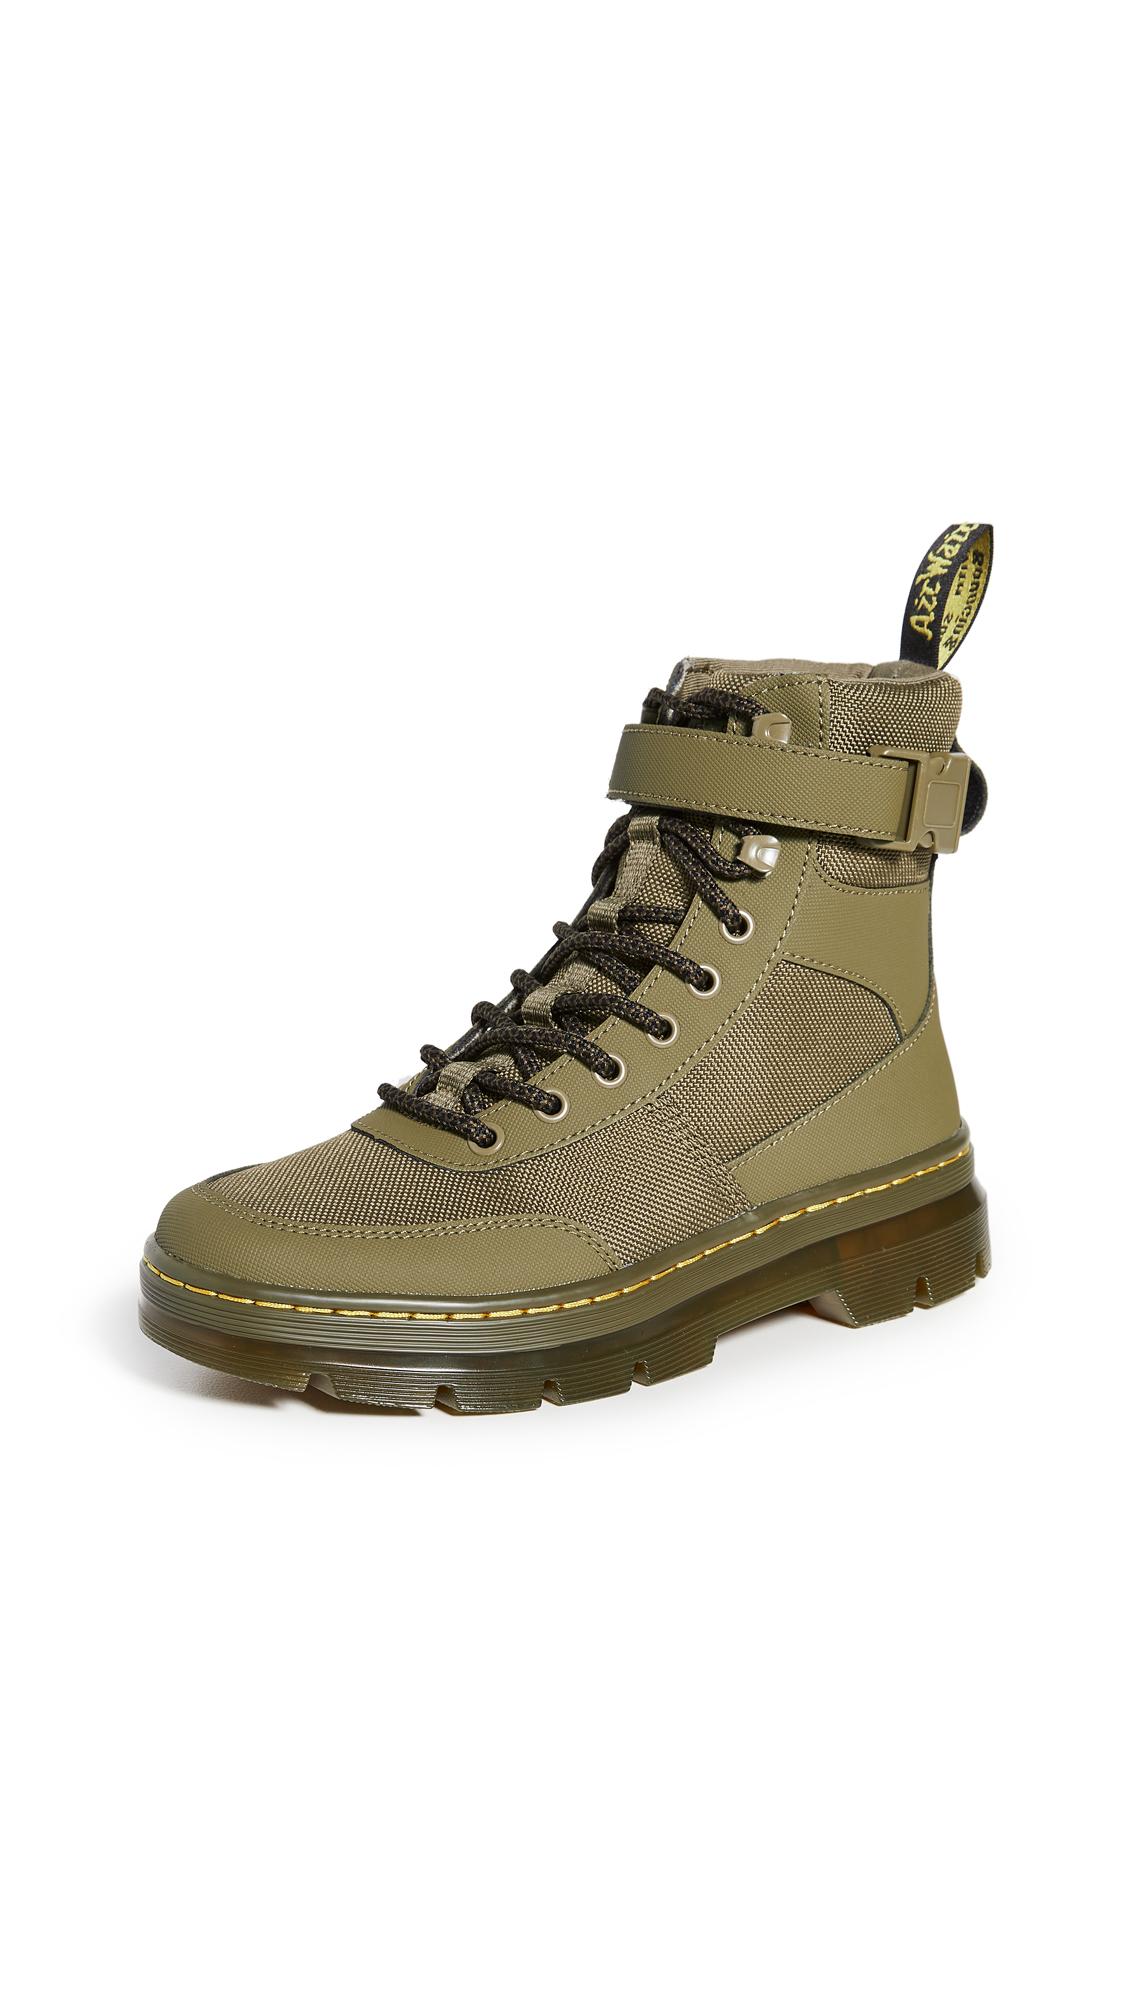 Buy Dr. Martens Combs Tech 8 Tie Boots online, shop Dr. Martens